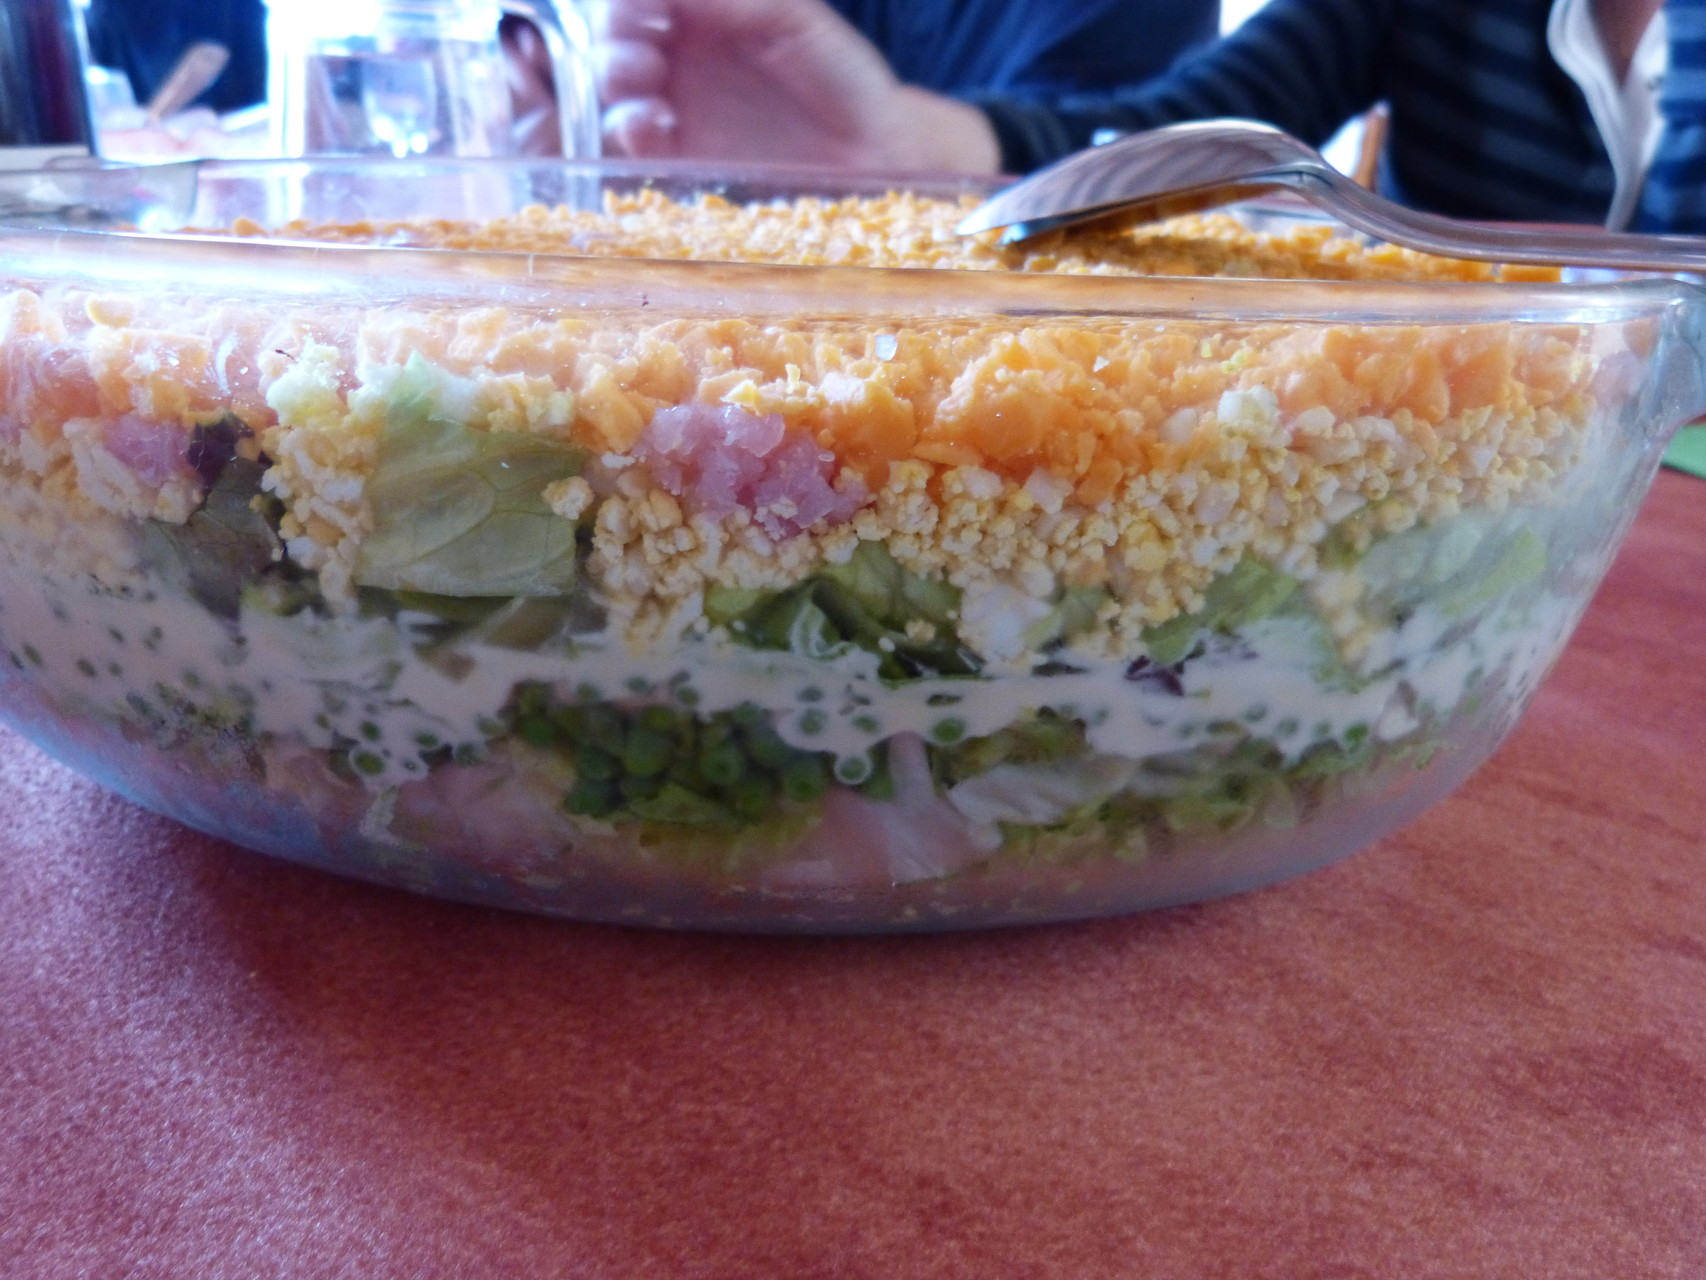 salade à étage